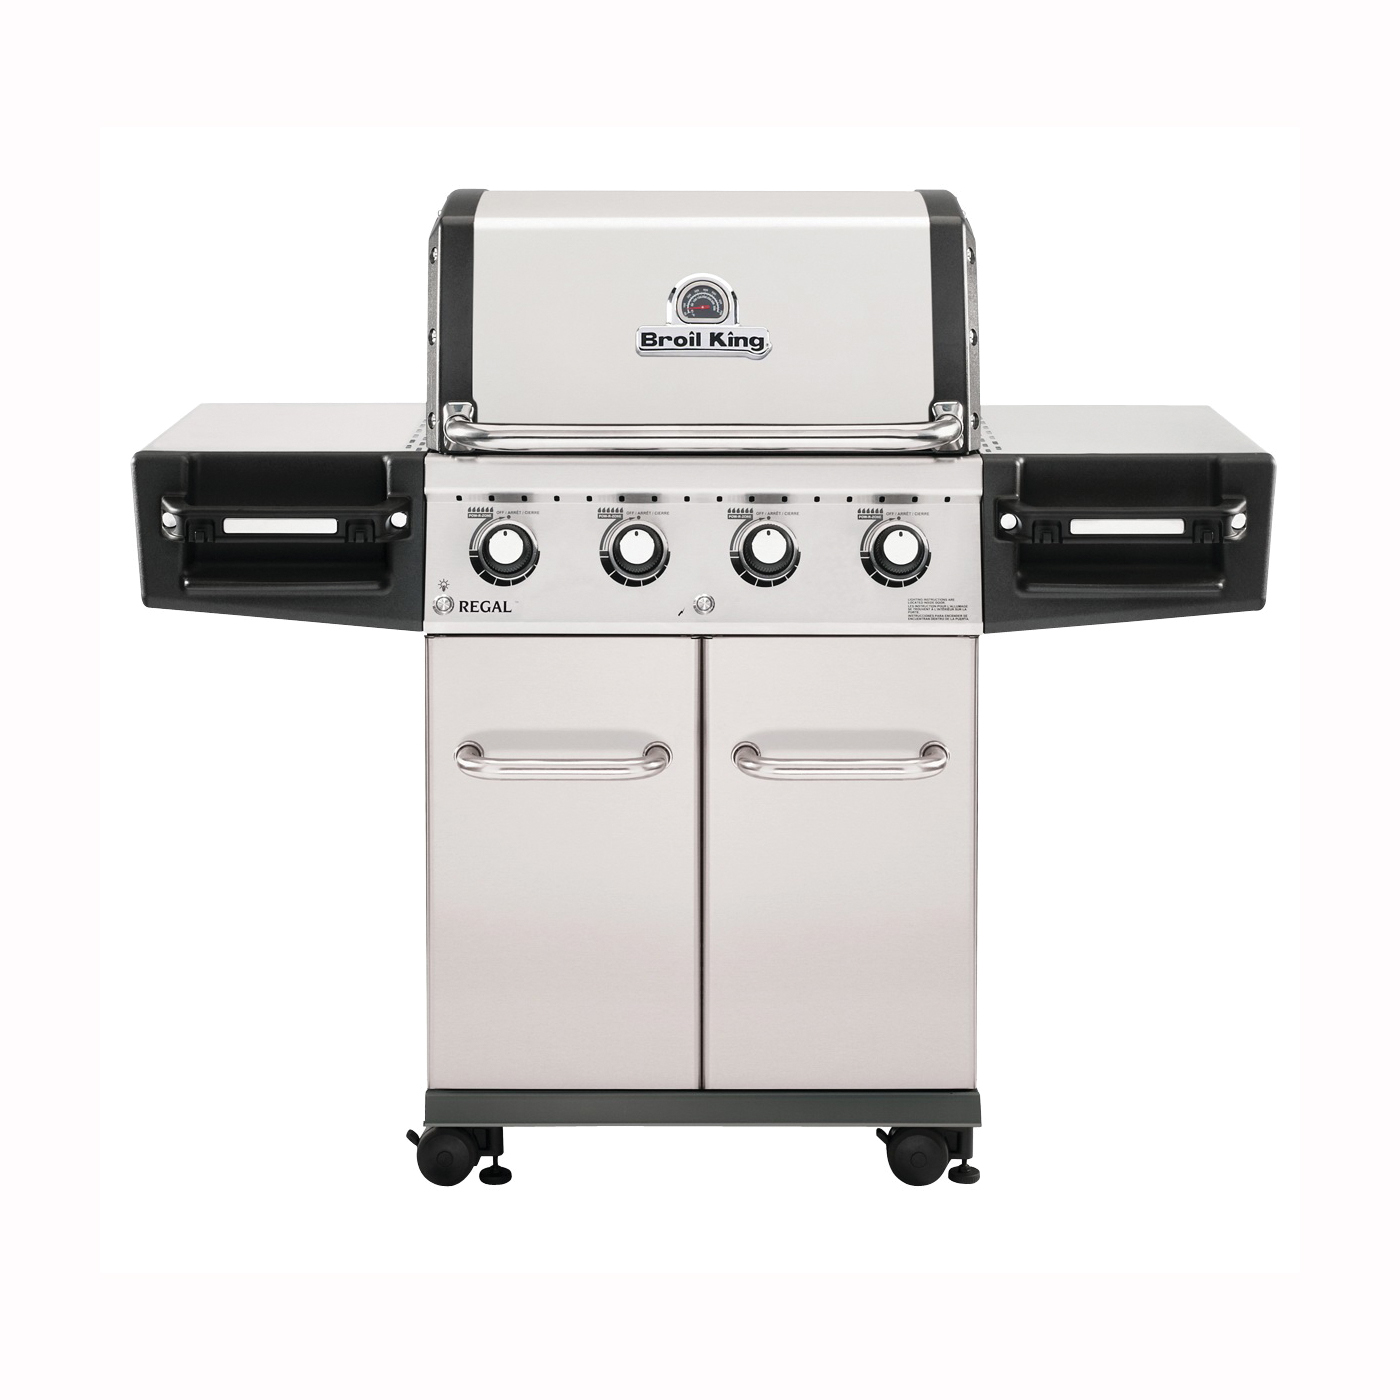 Picture of Broil King Regal 956314 Gas Grill, 55000 Btu/hr BTU, Liquid Propane, 4 -Burner, 500 sq-in Primary Cooking Surface